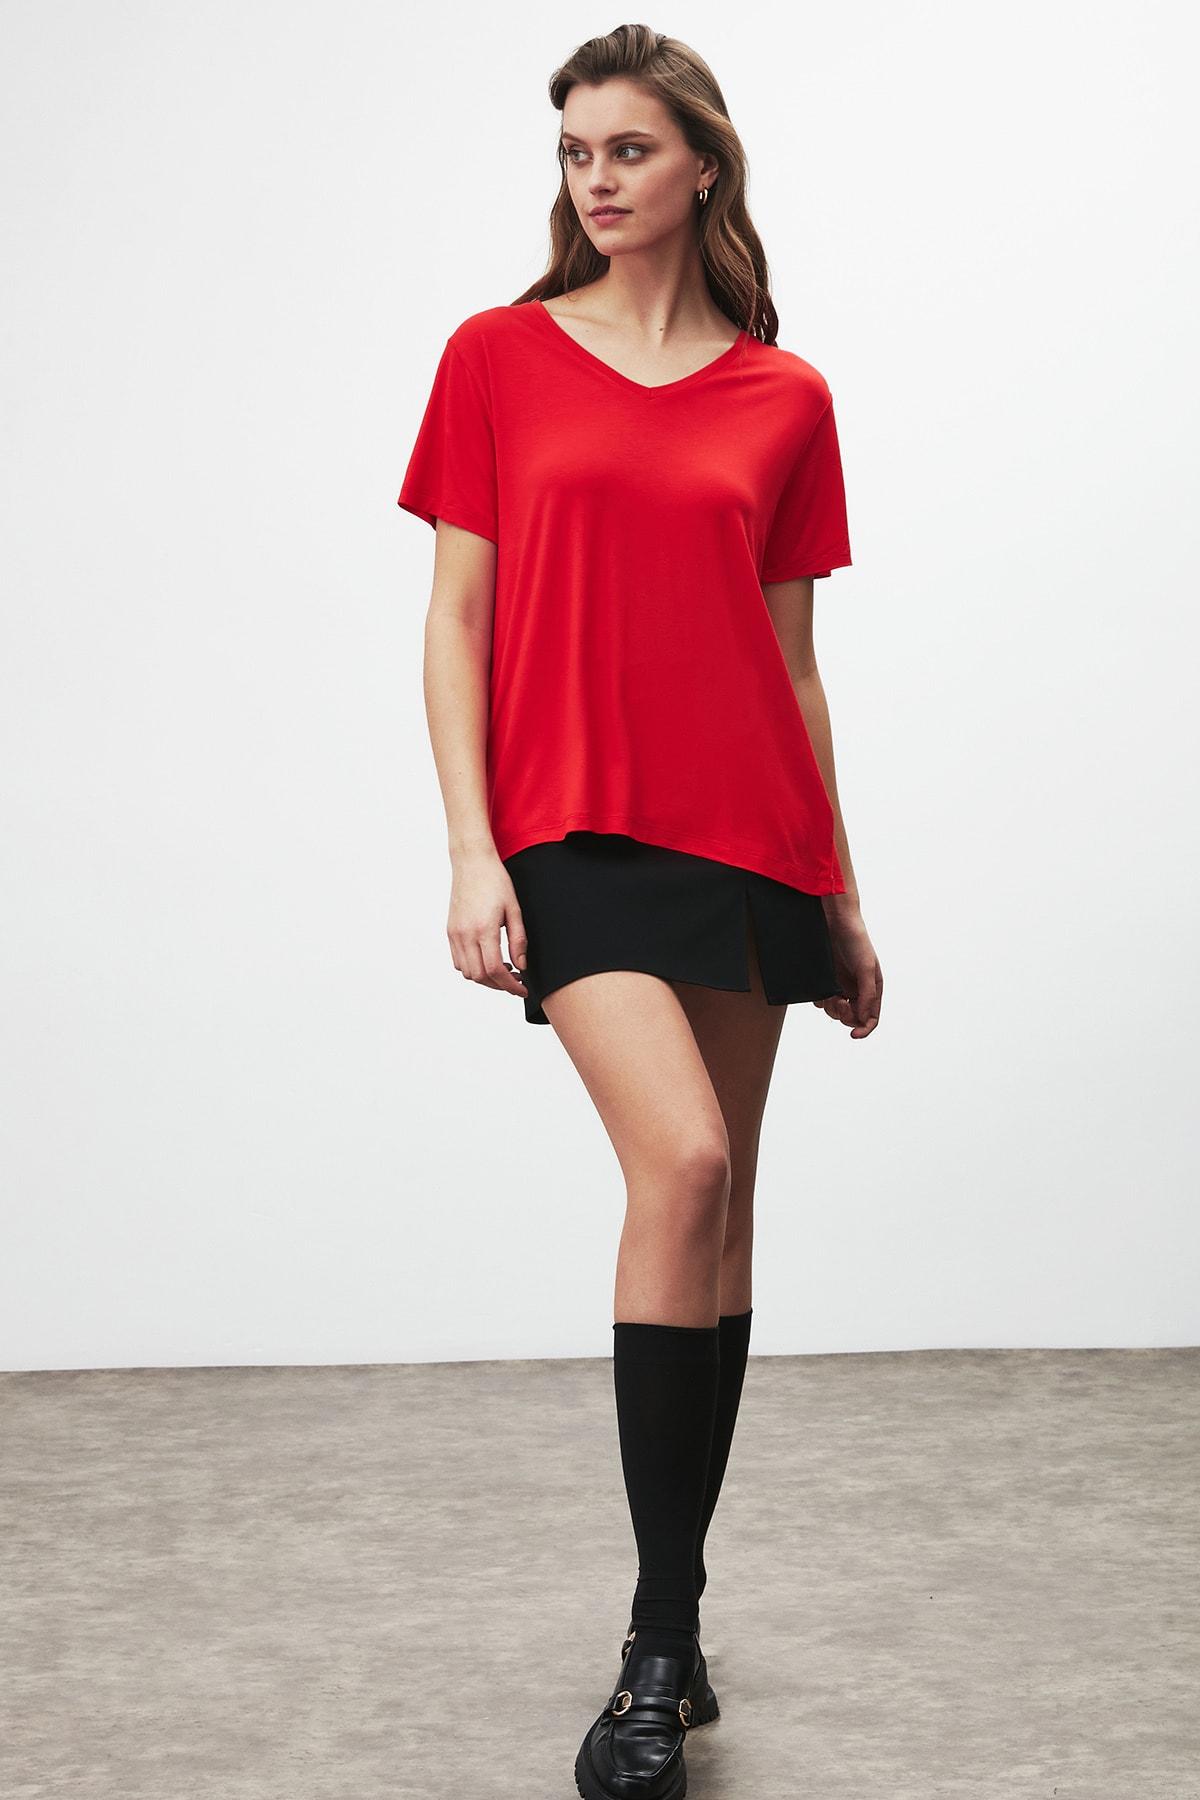 GRIMELANGE Vıolet Kadın Kırmızı Comfort Fit V Yaka Kısa Kollu T-shirt 3